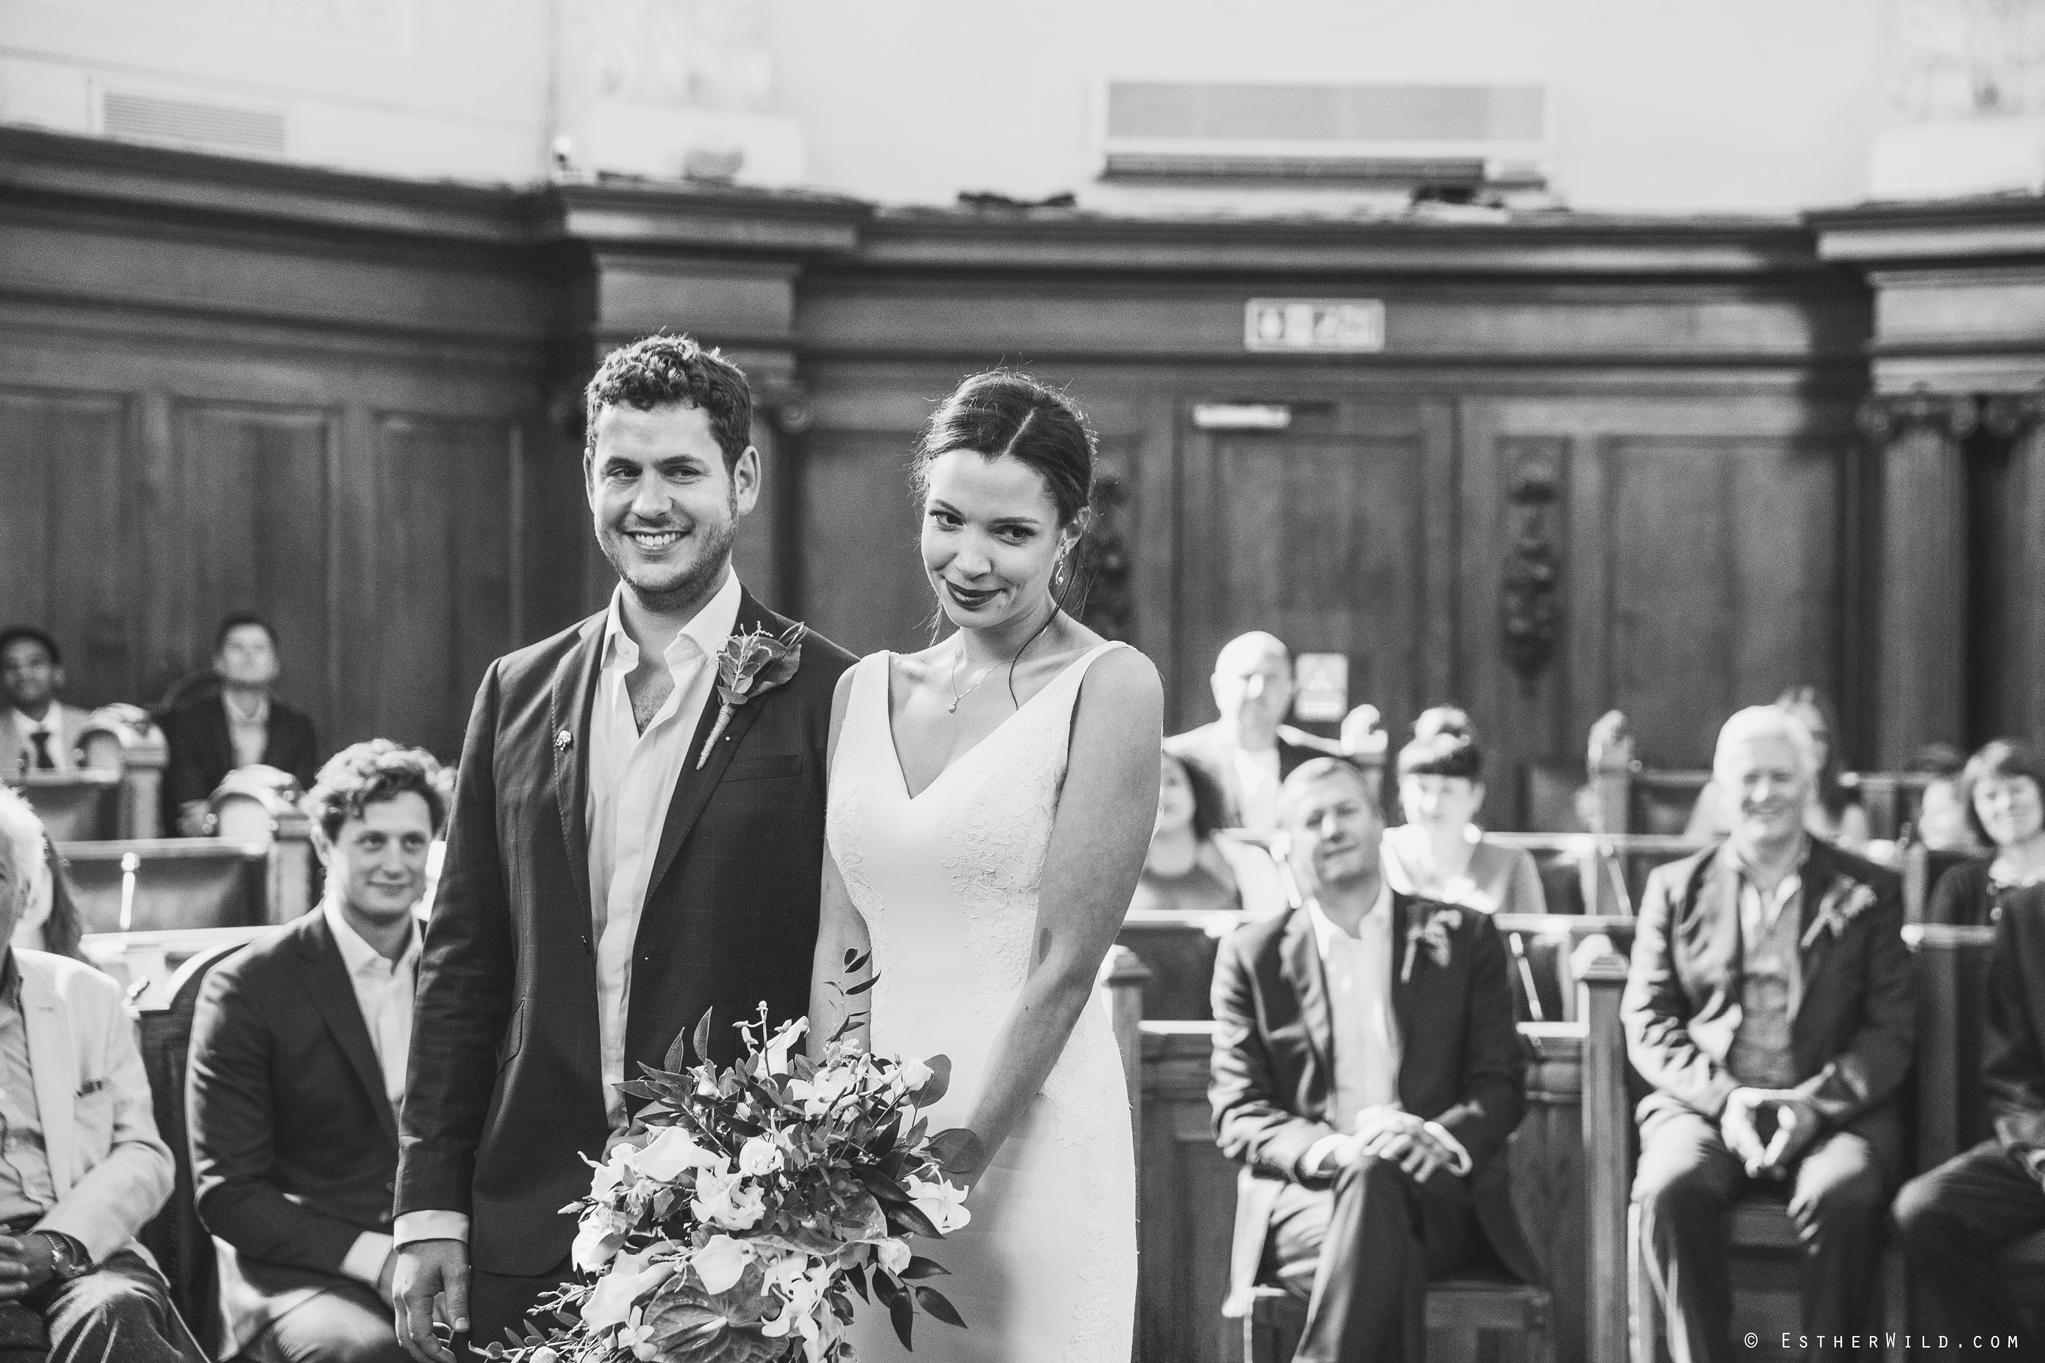 Islington_Town_Hall_Wedding_London_Photographer_Esther_Wild_IMG_4825-1.jpg